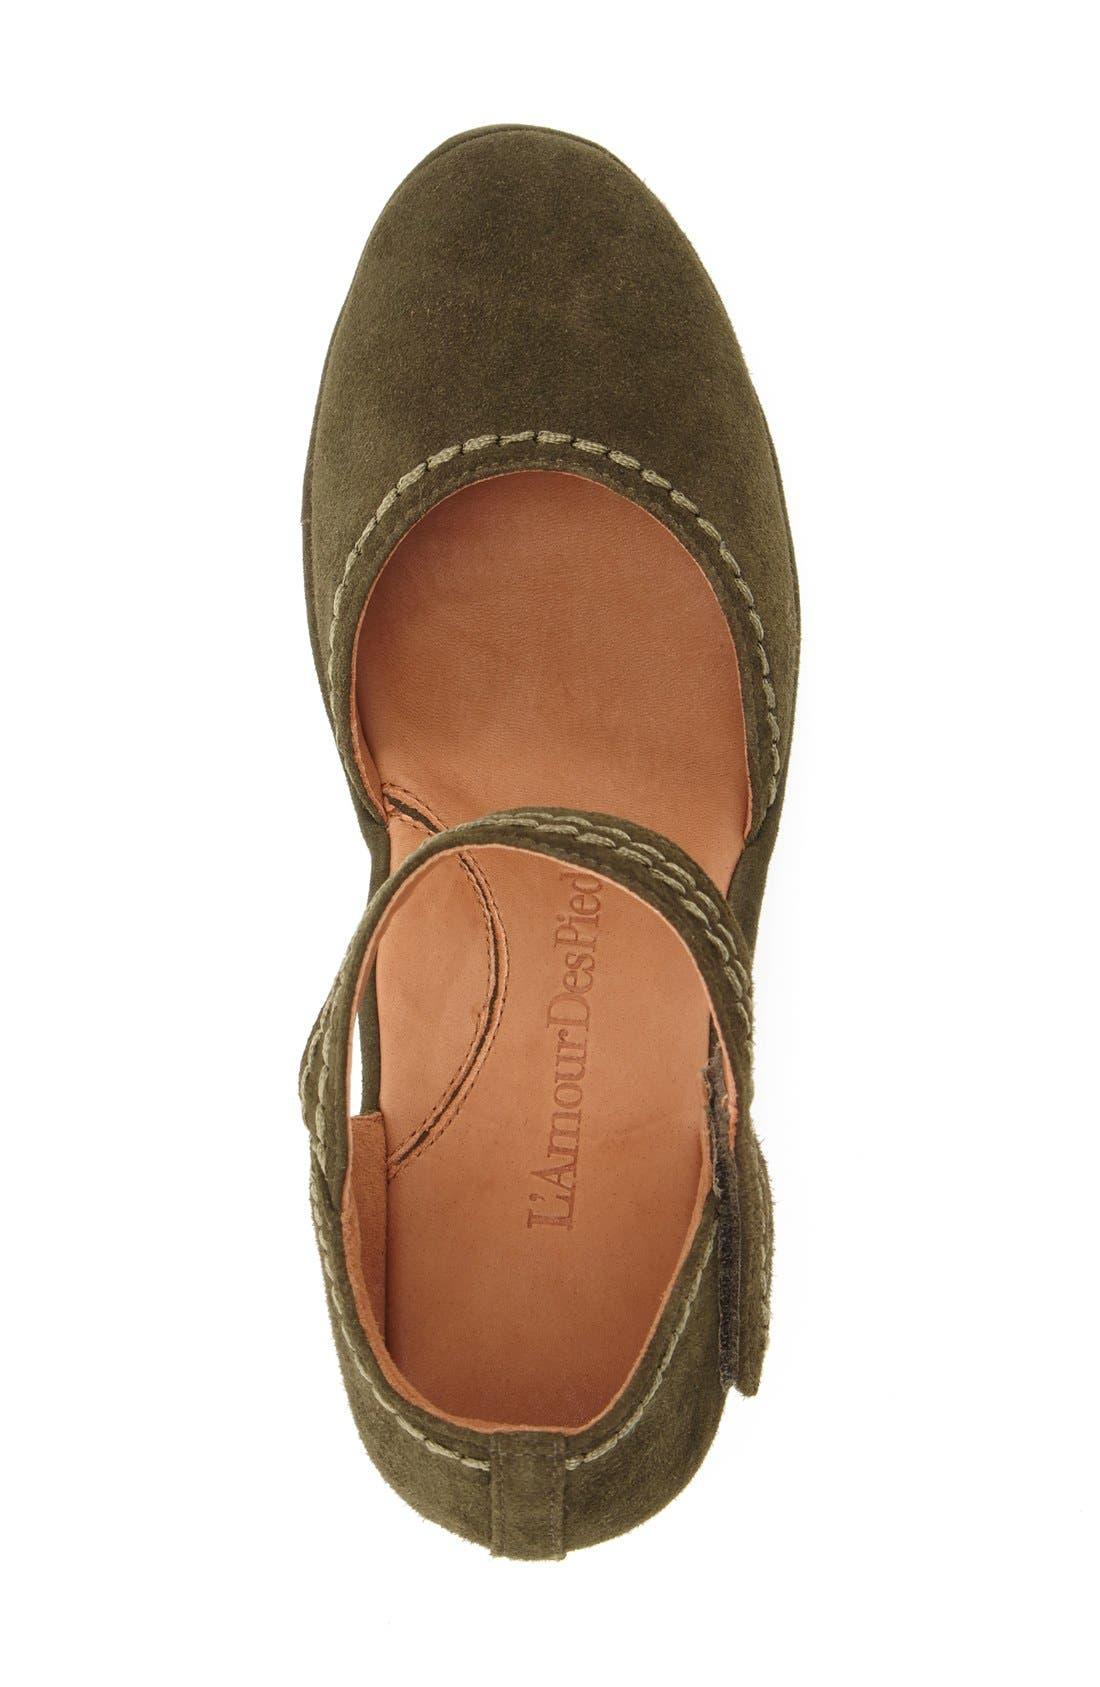 Alternate Image 3  - L'Amourdes Pieds'Orva' Wedge Sandal (Women)